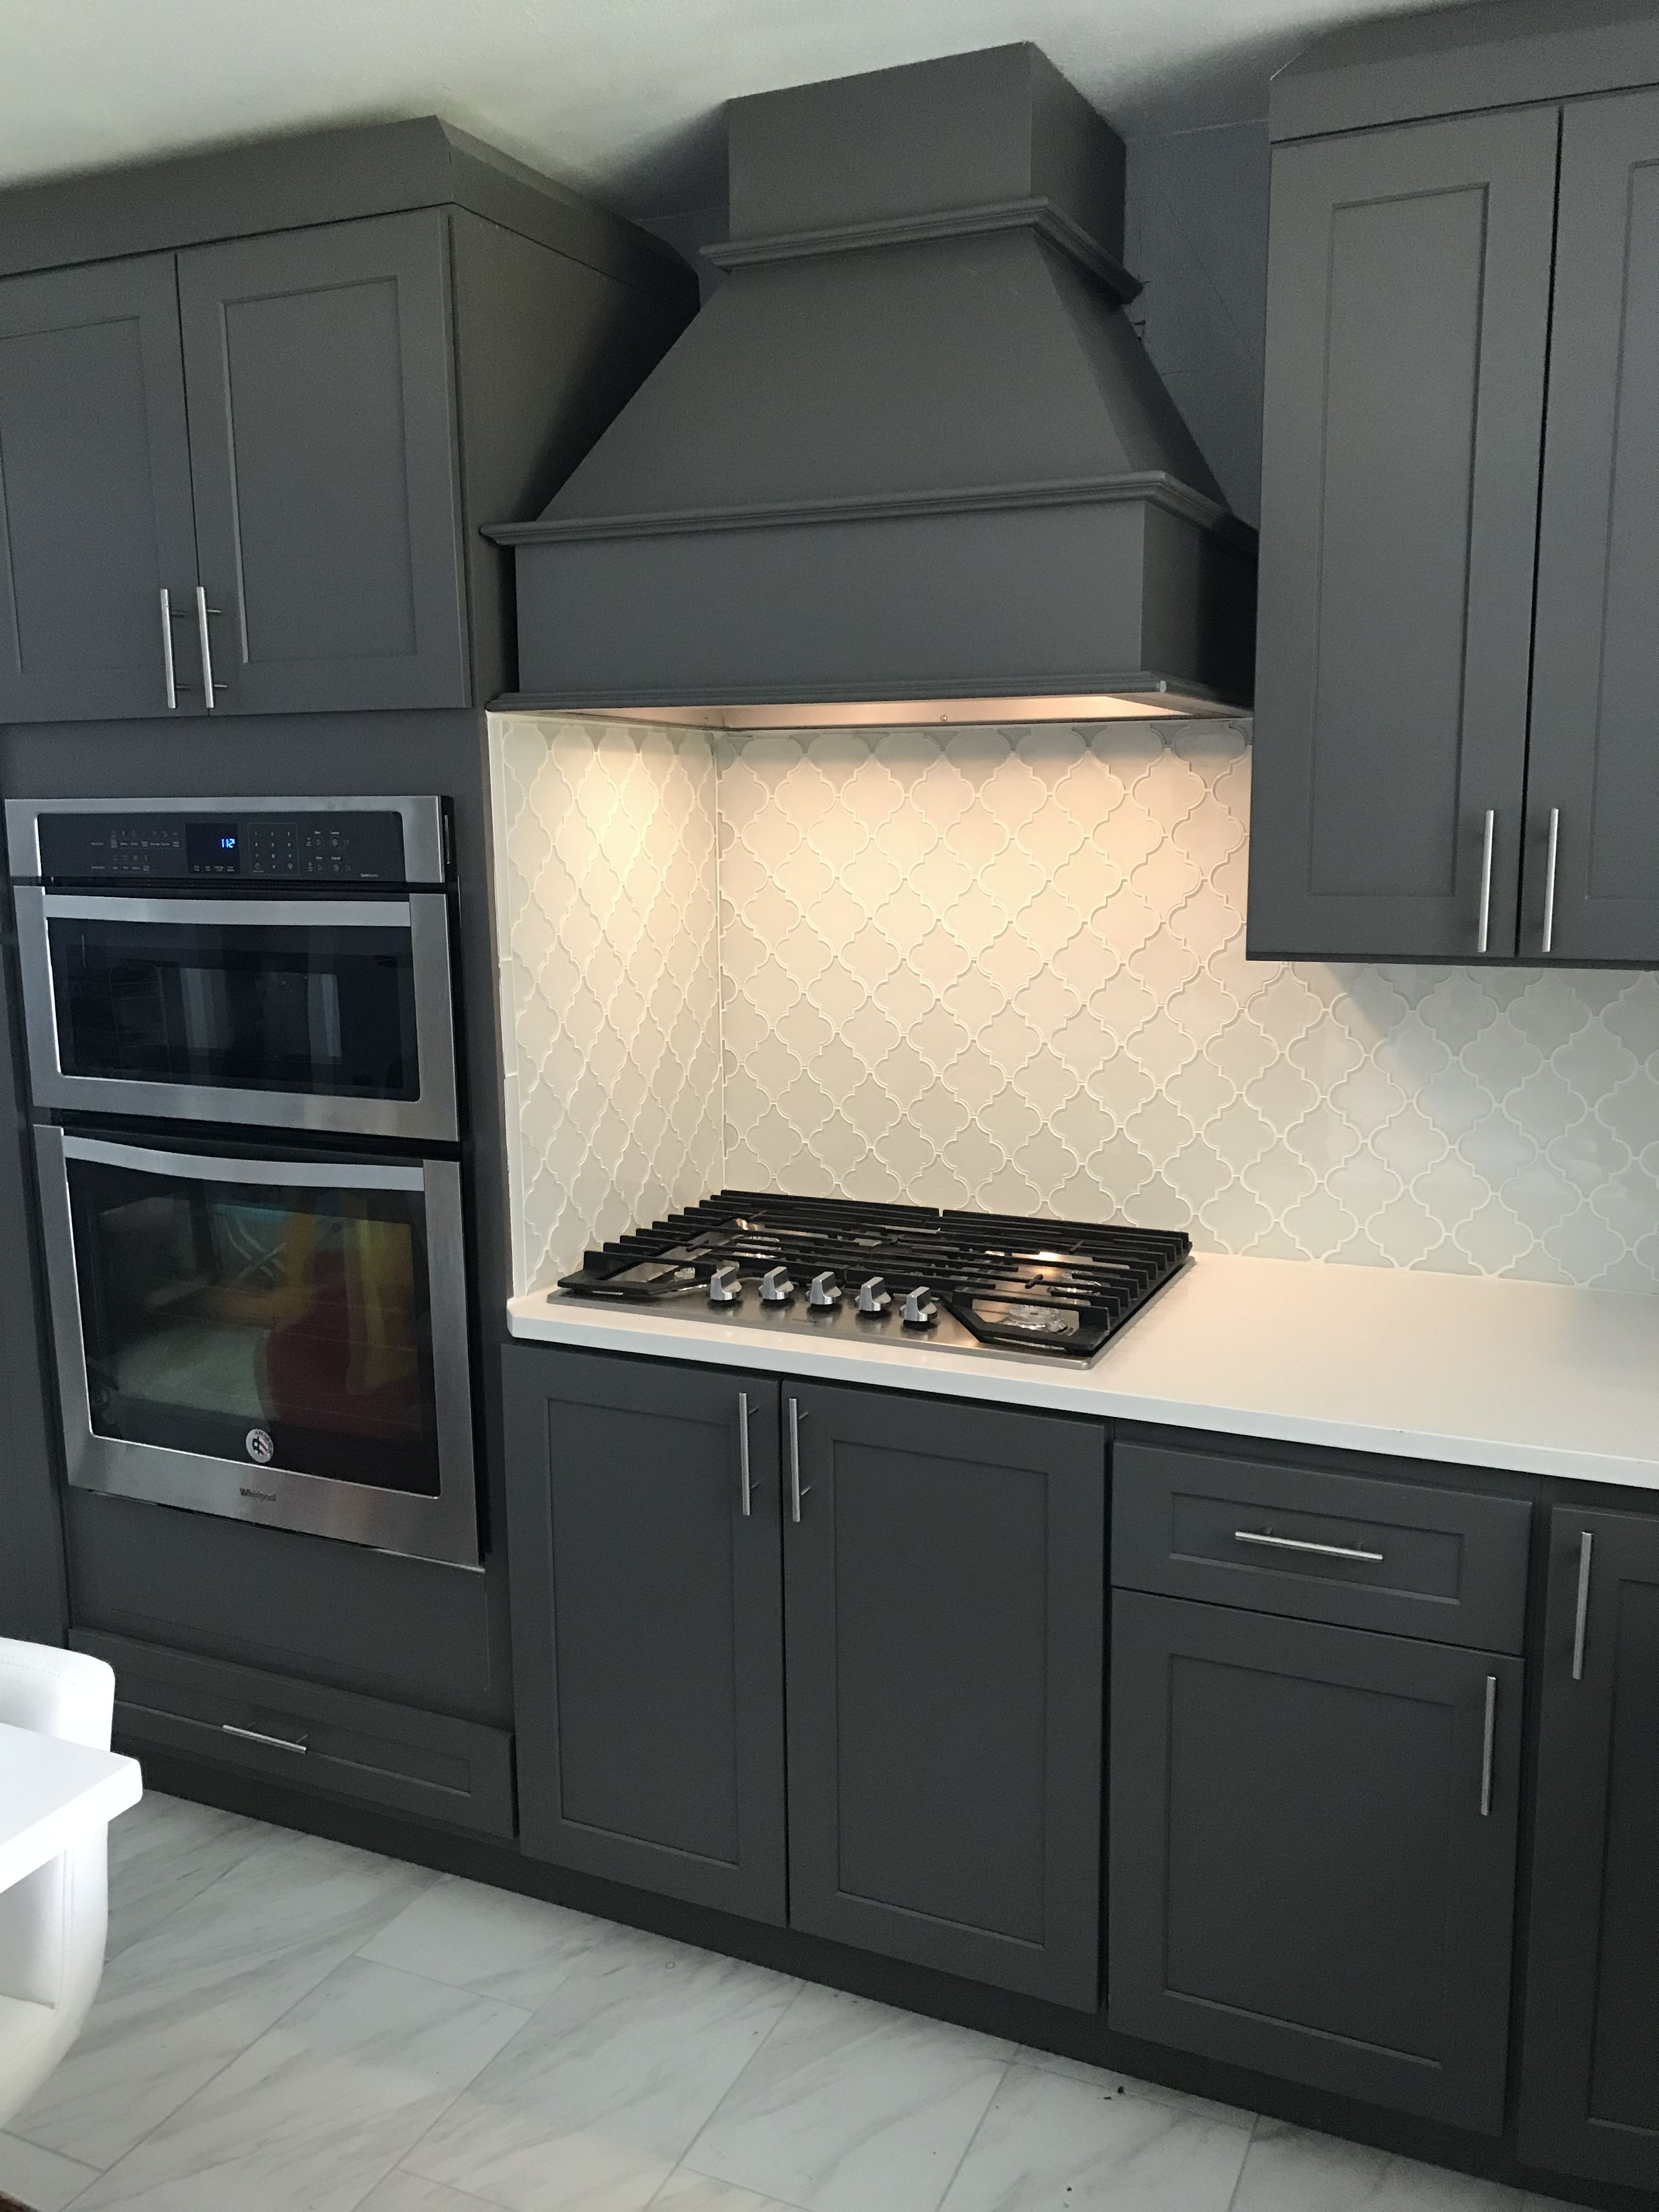 Backsplash tile on cabinet. Grey and white kitchen. Glass ...